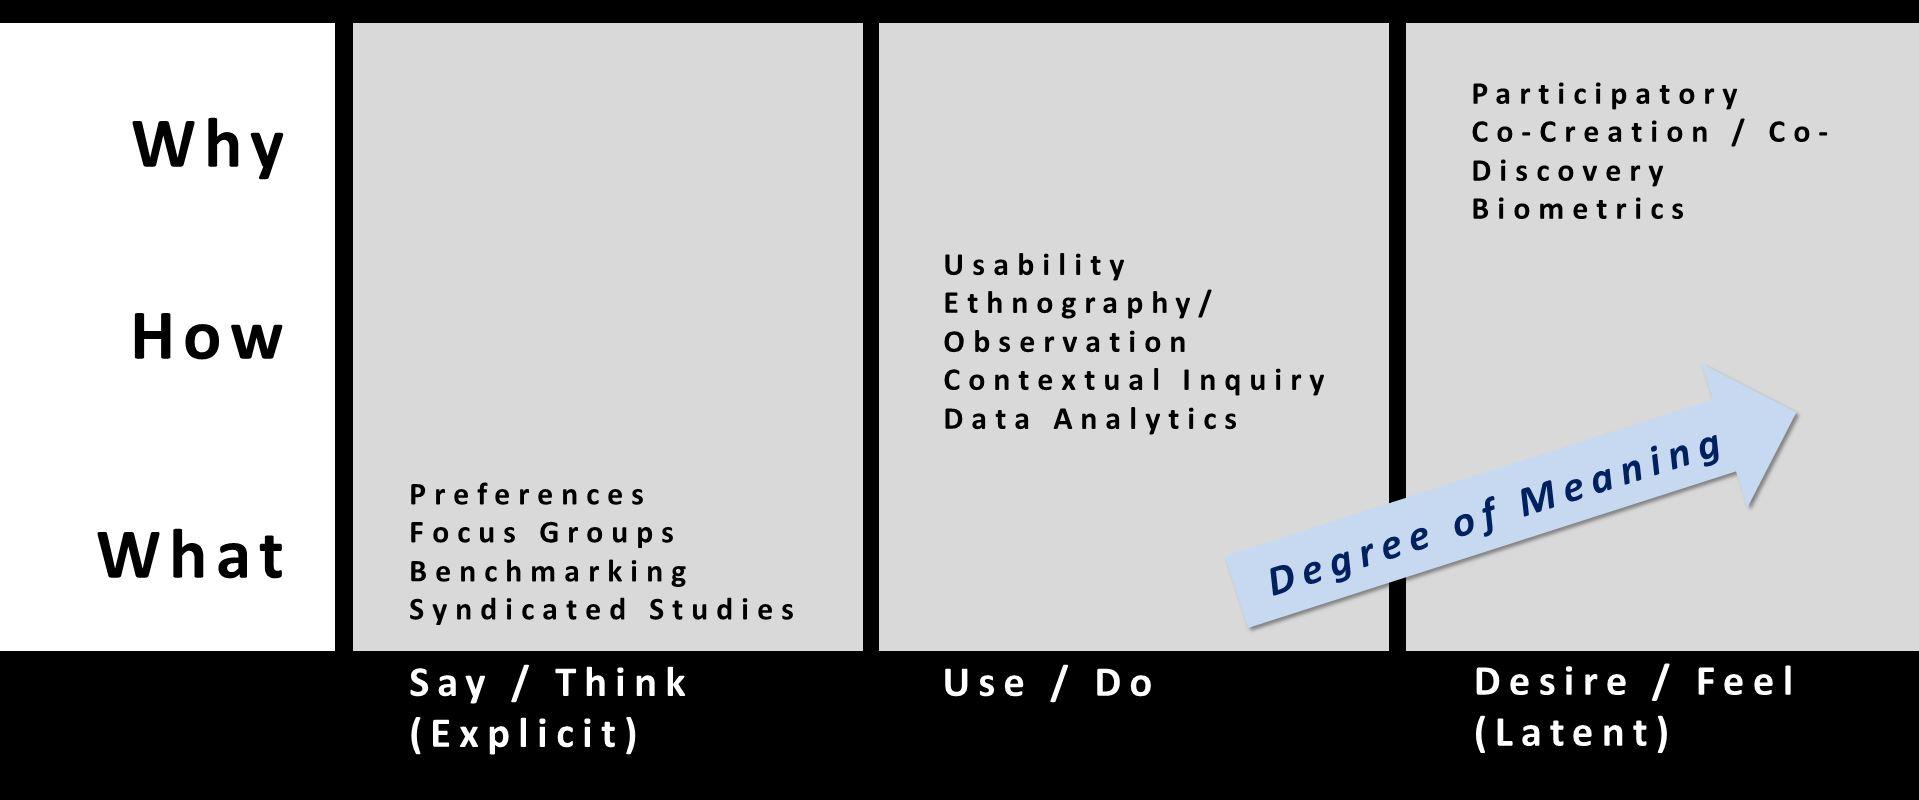 Research_Types_1.JPG